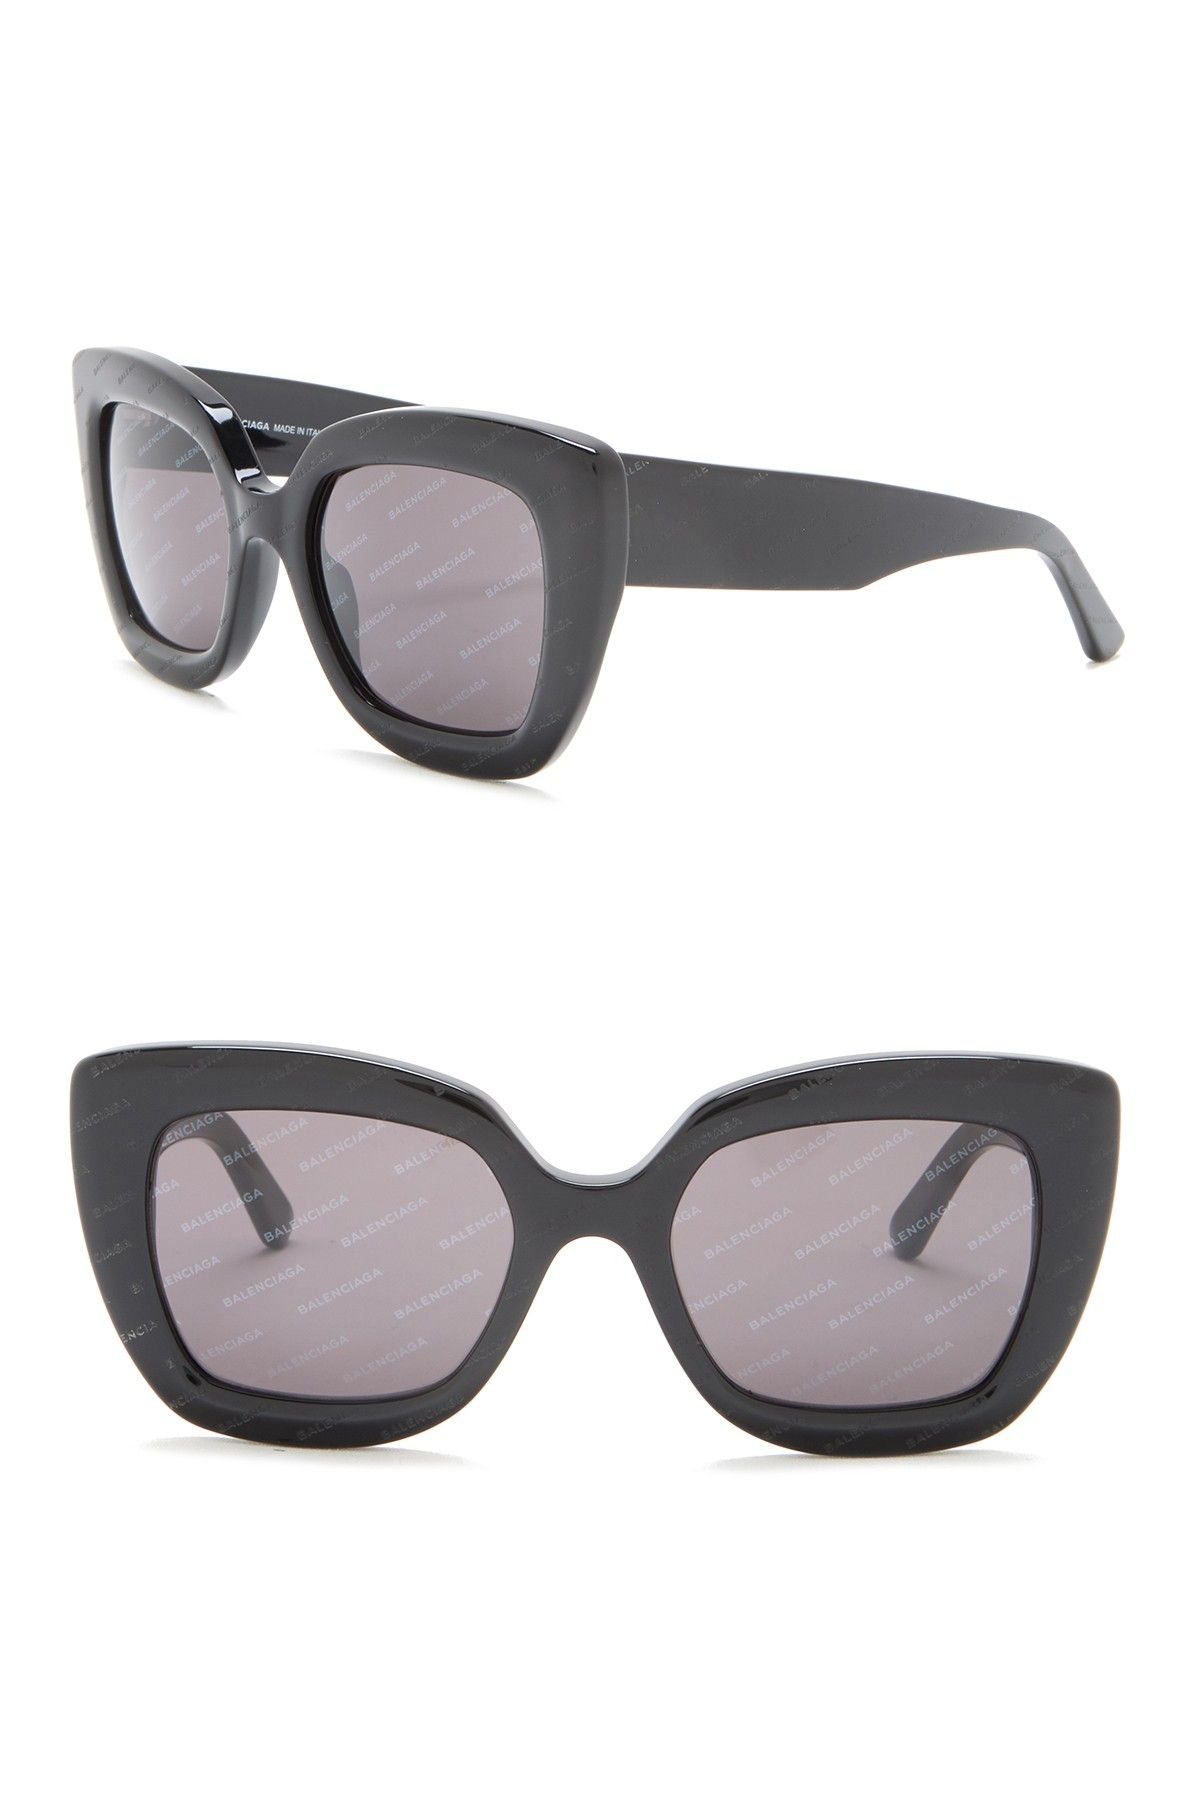 Balenciaga   52mm Oversized Sunglasses